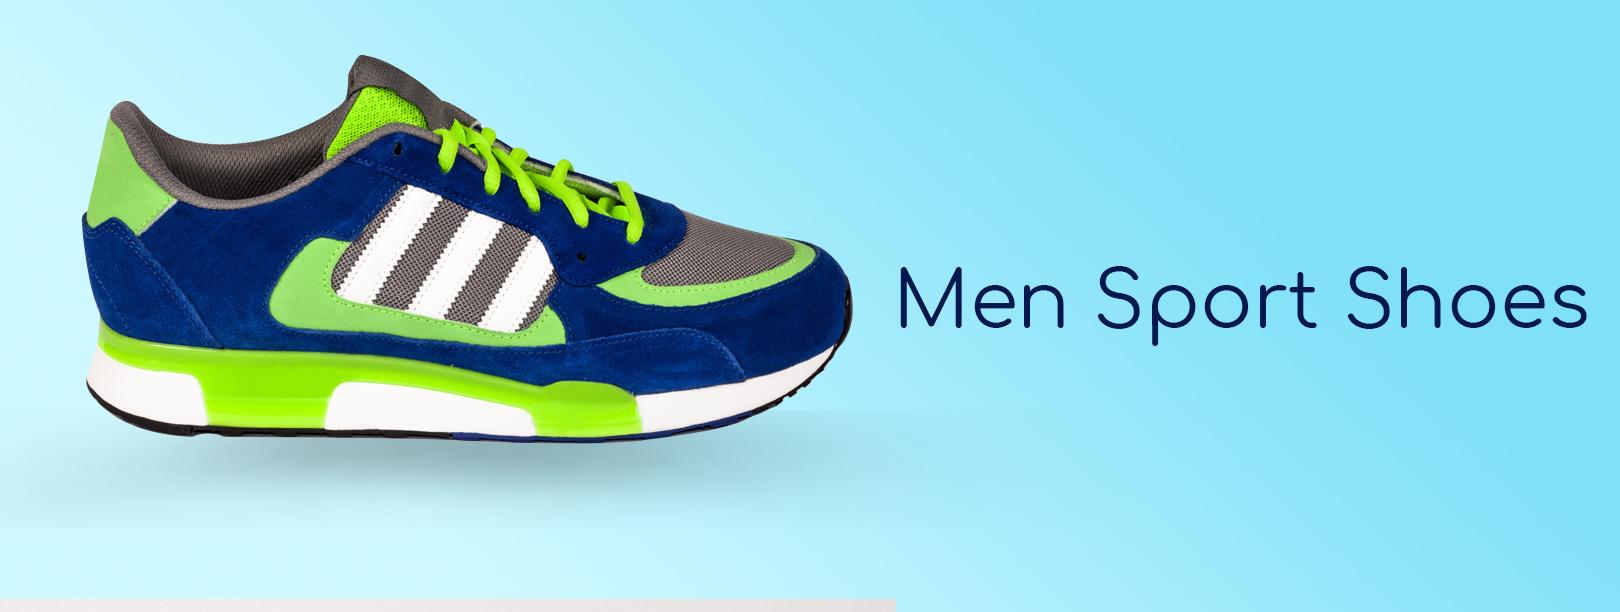 Myntra Men Sports Shoes